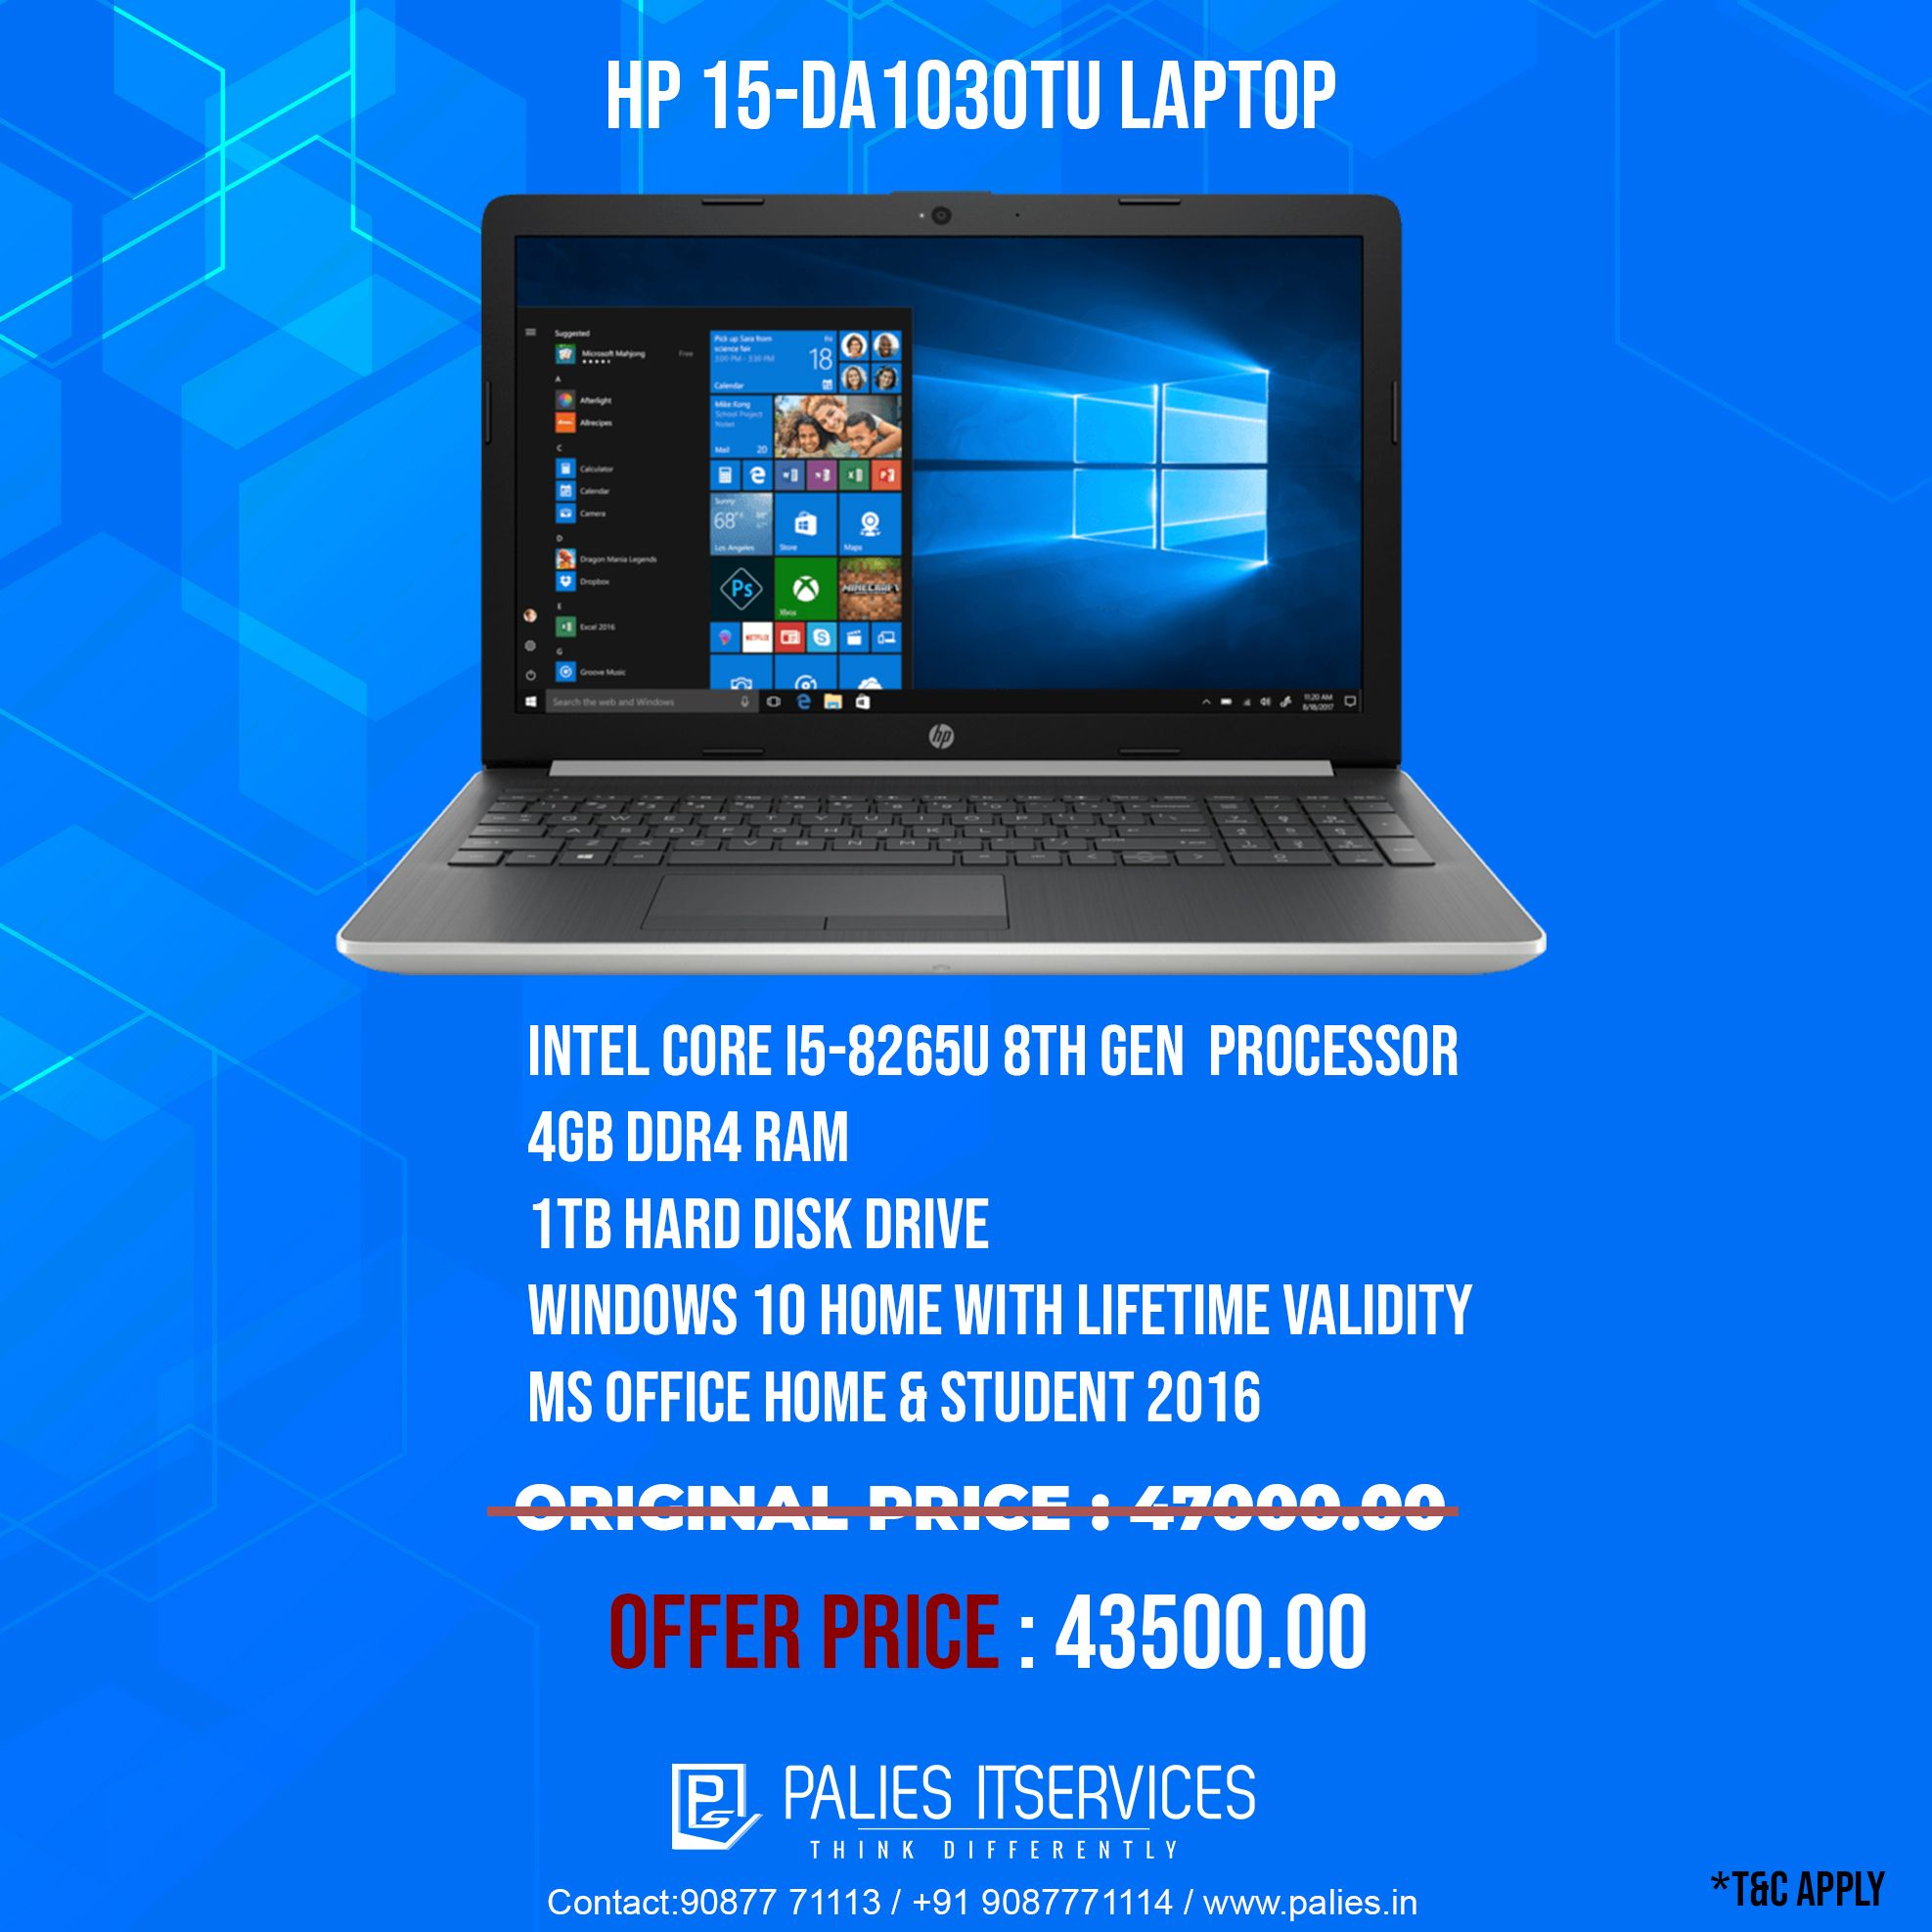 ddr3 sur carte mere ddr4 Intel Core i58265u 8th Gen #Processor 4GB DDR3 #RAM 1TB #HardDrive